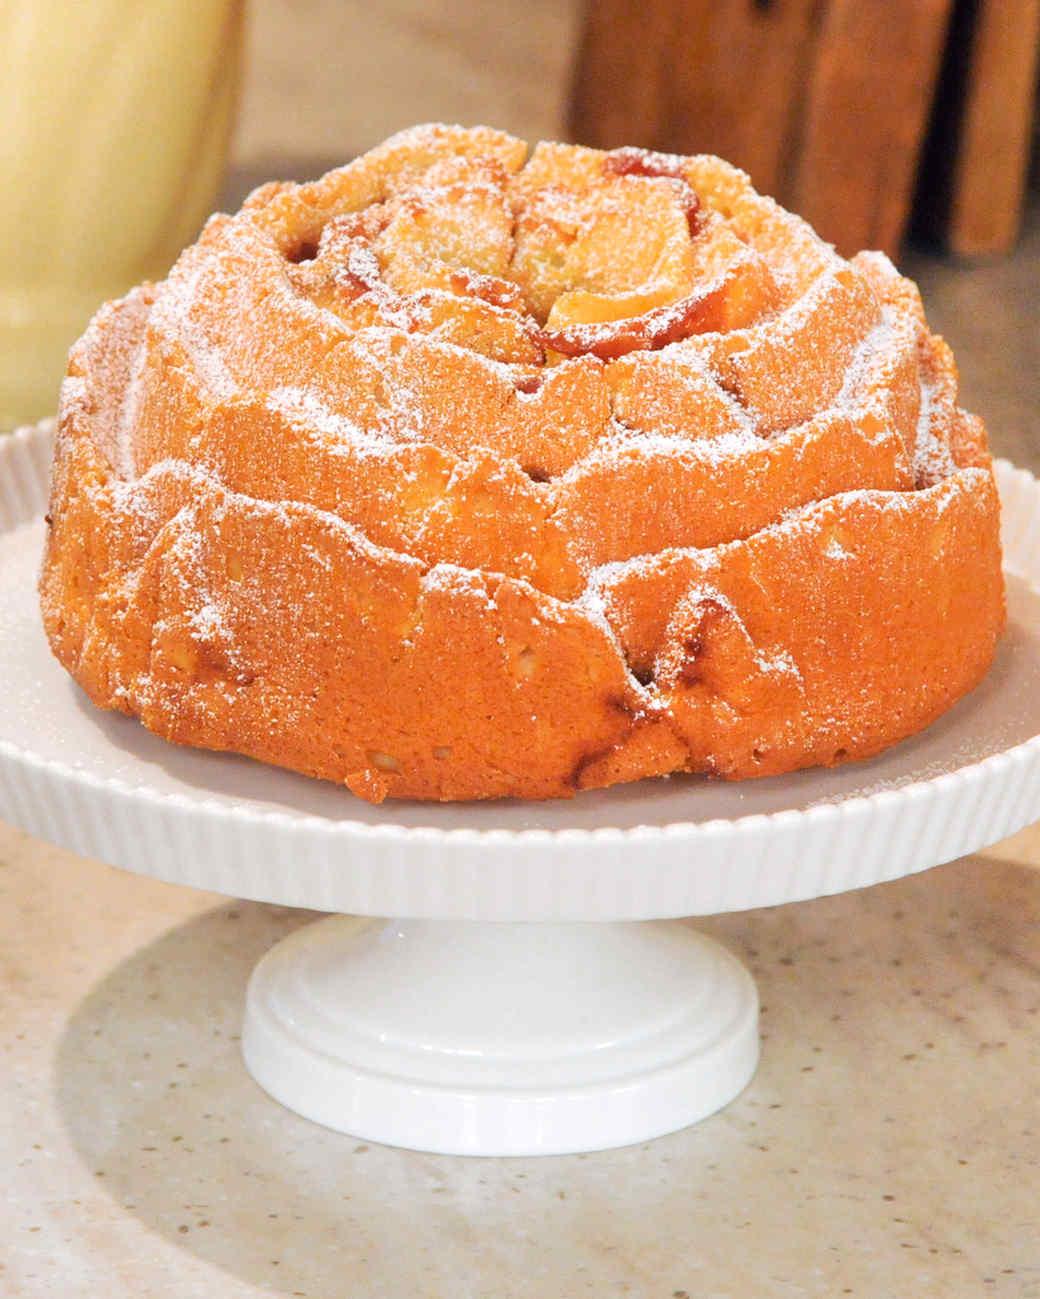 vanillia-bunt-cake-mslb7040.jpg